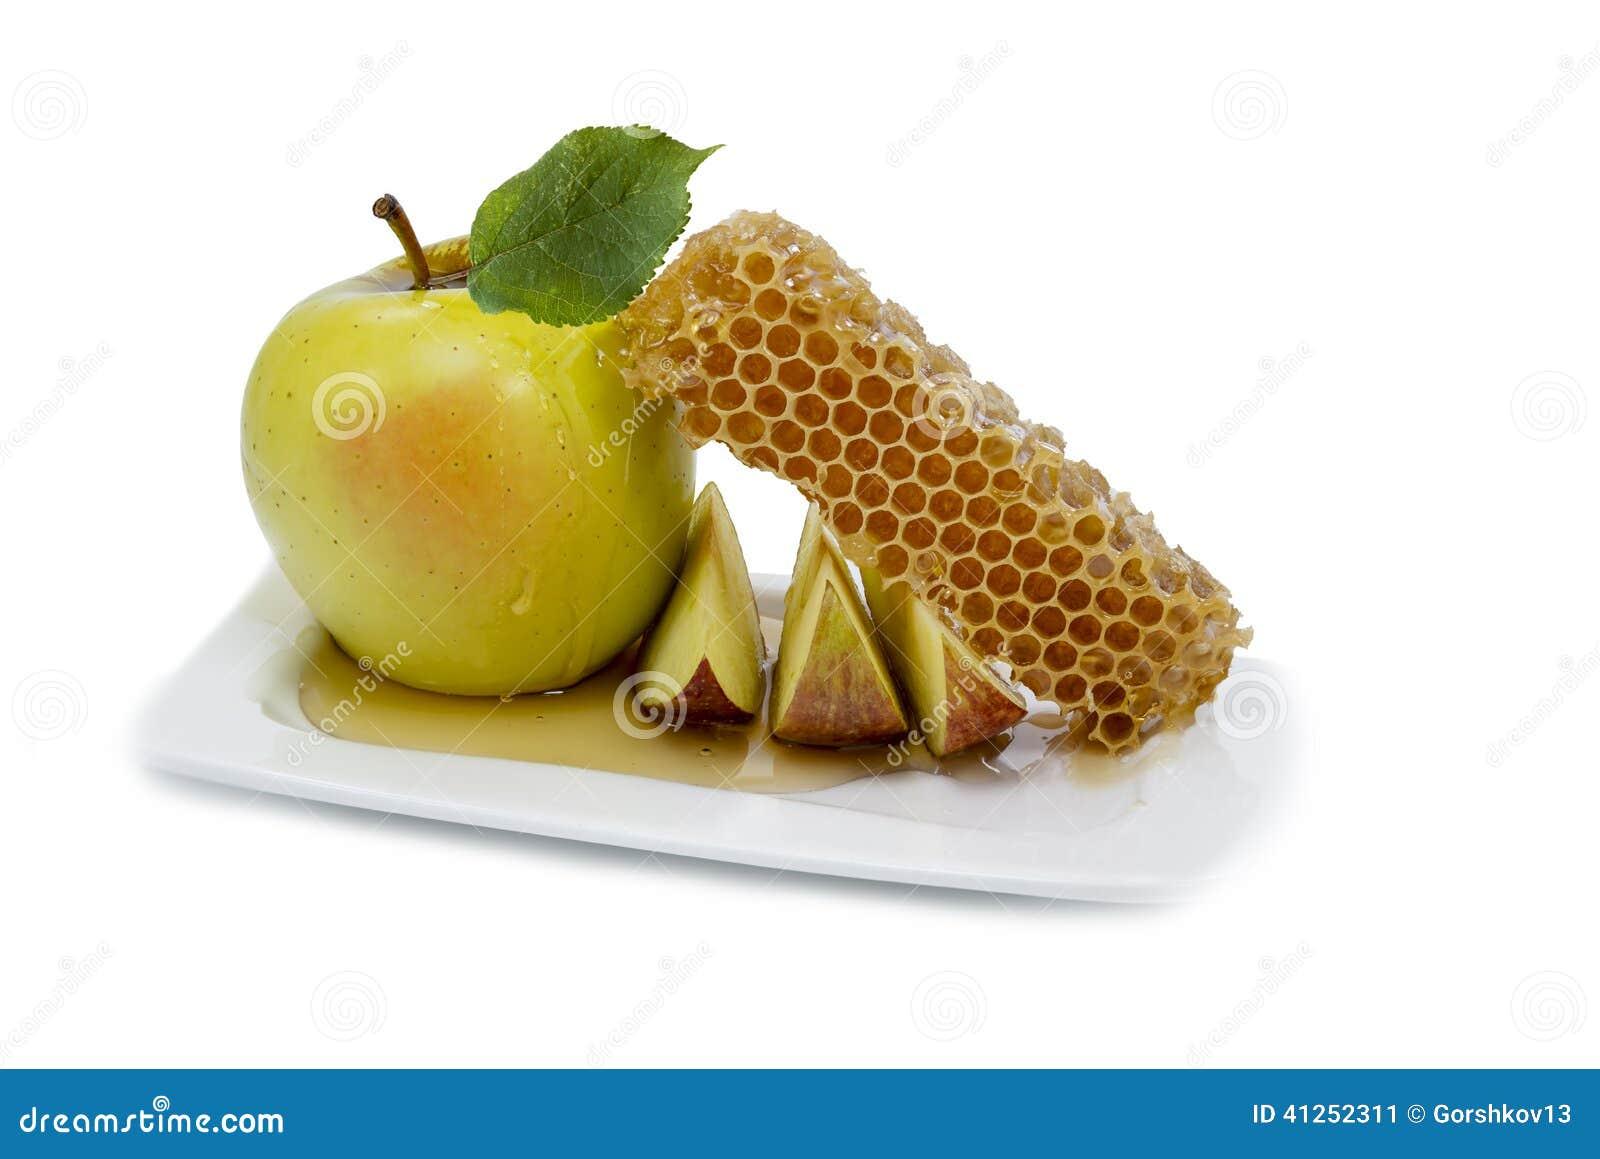 Honey and apple are symbols of rosh hashanah stock image image honey and apple are symbols of rosh hashanah biocorpaavc